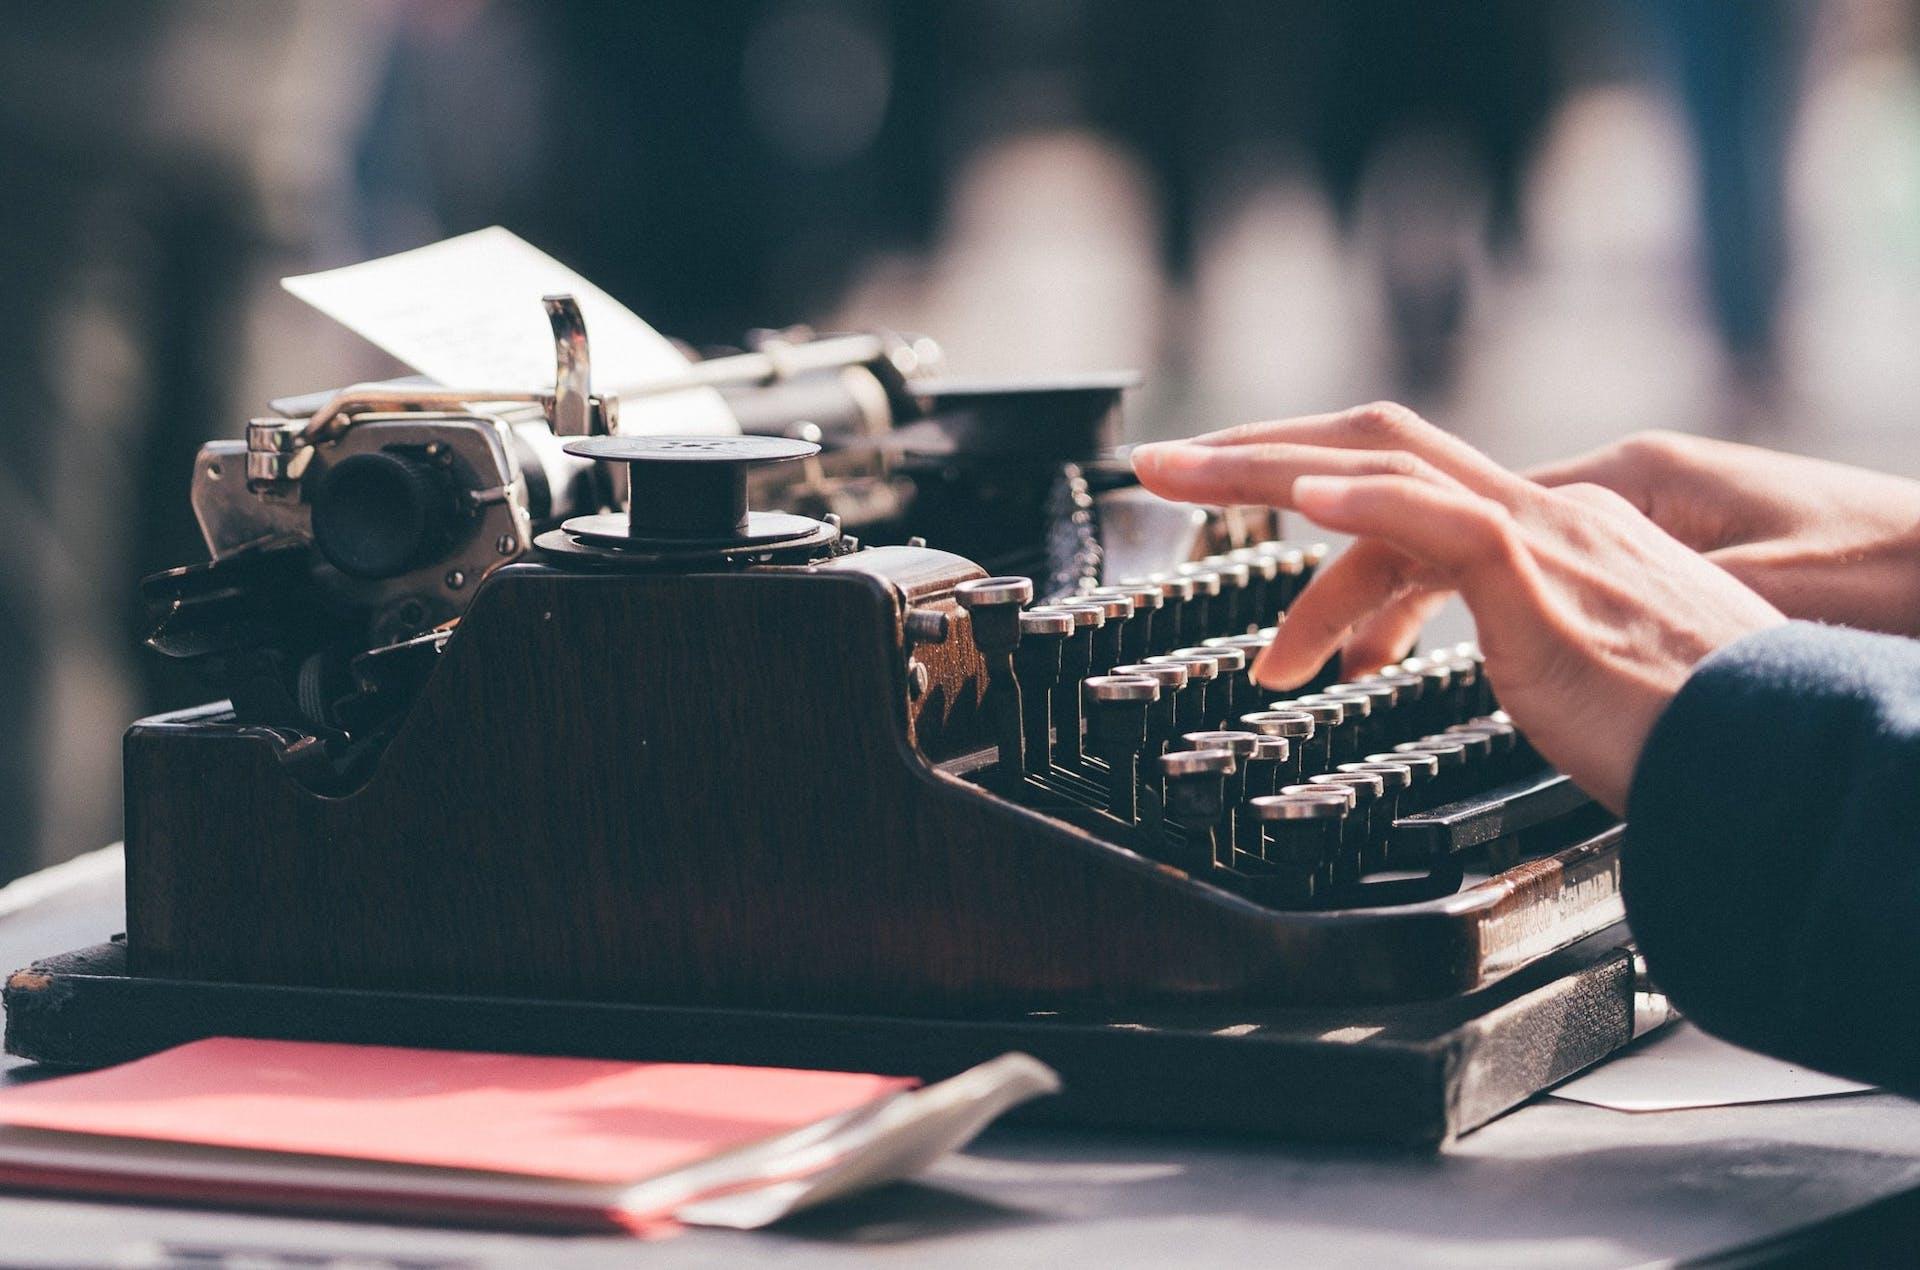 ¿Cómo escribir un libro? 7 consejos que te convertirán en un gran escritor